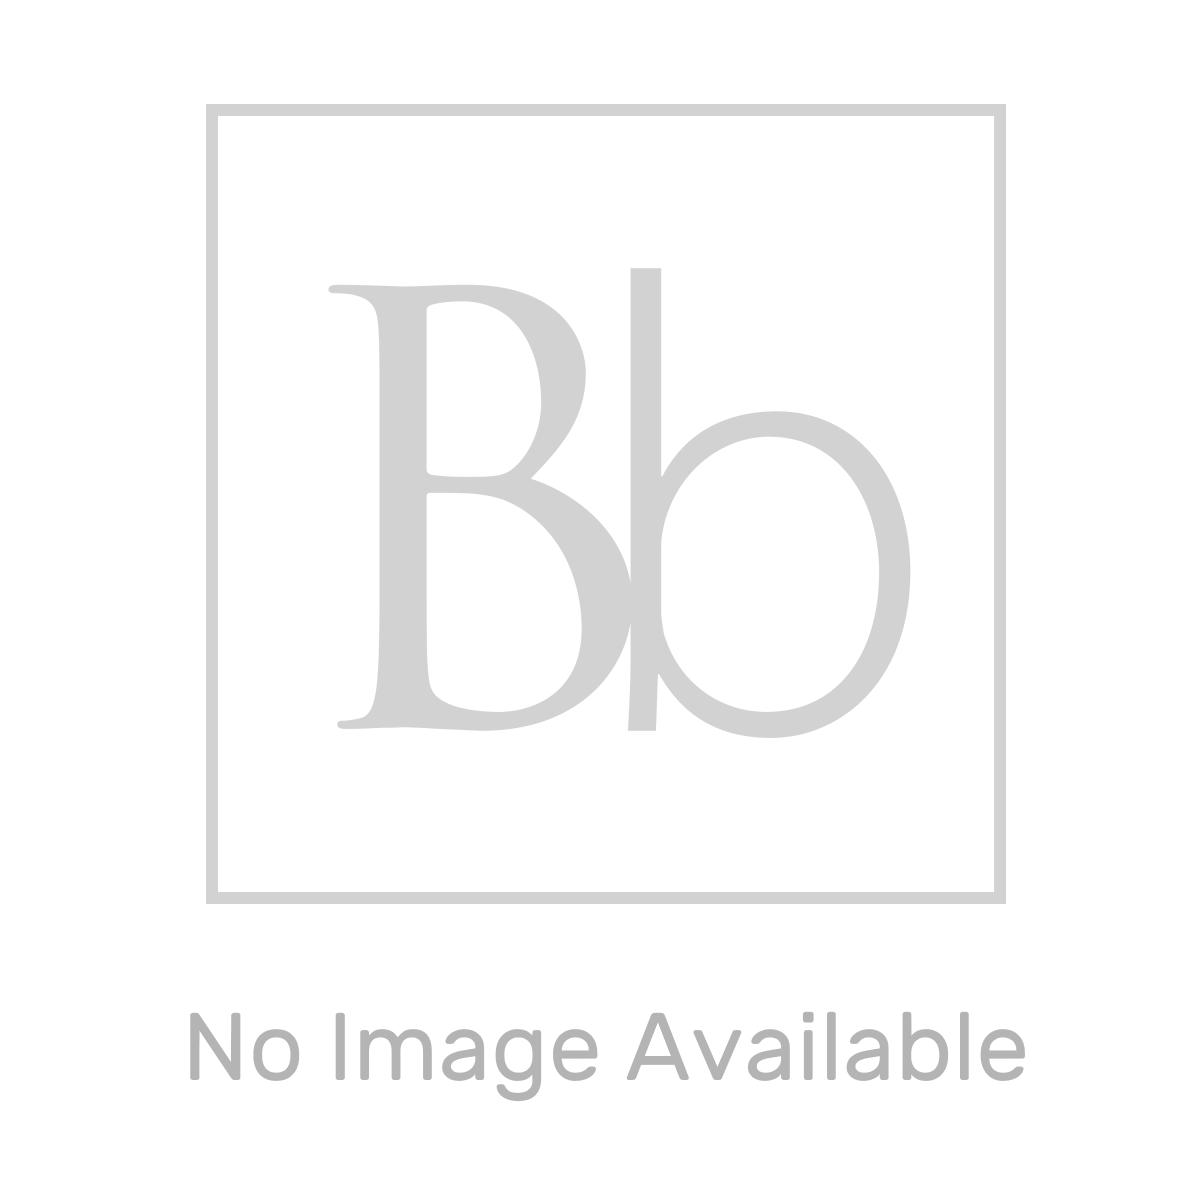 RAK Series 600 Back To Wall Toilet and 400 Series Gloss White Mini Vanity Unit